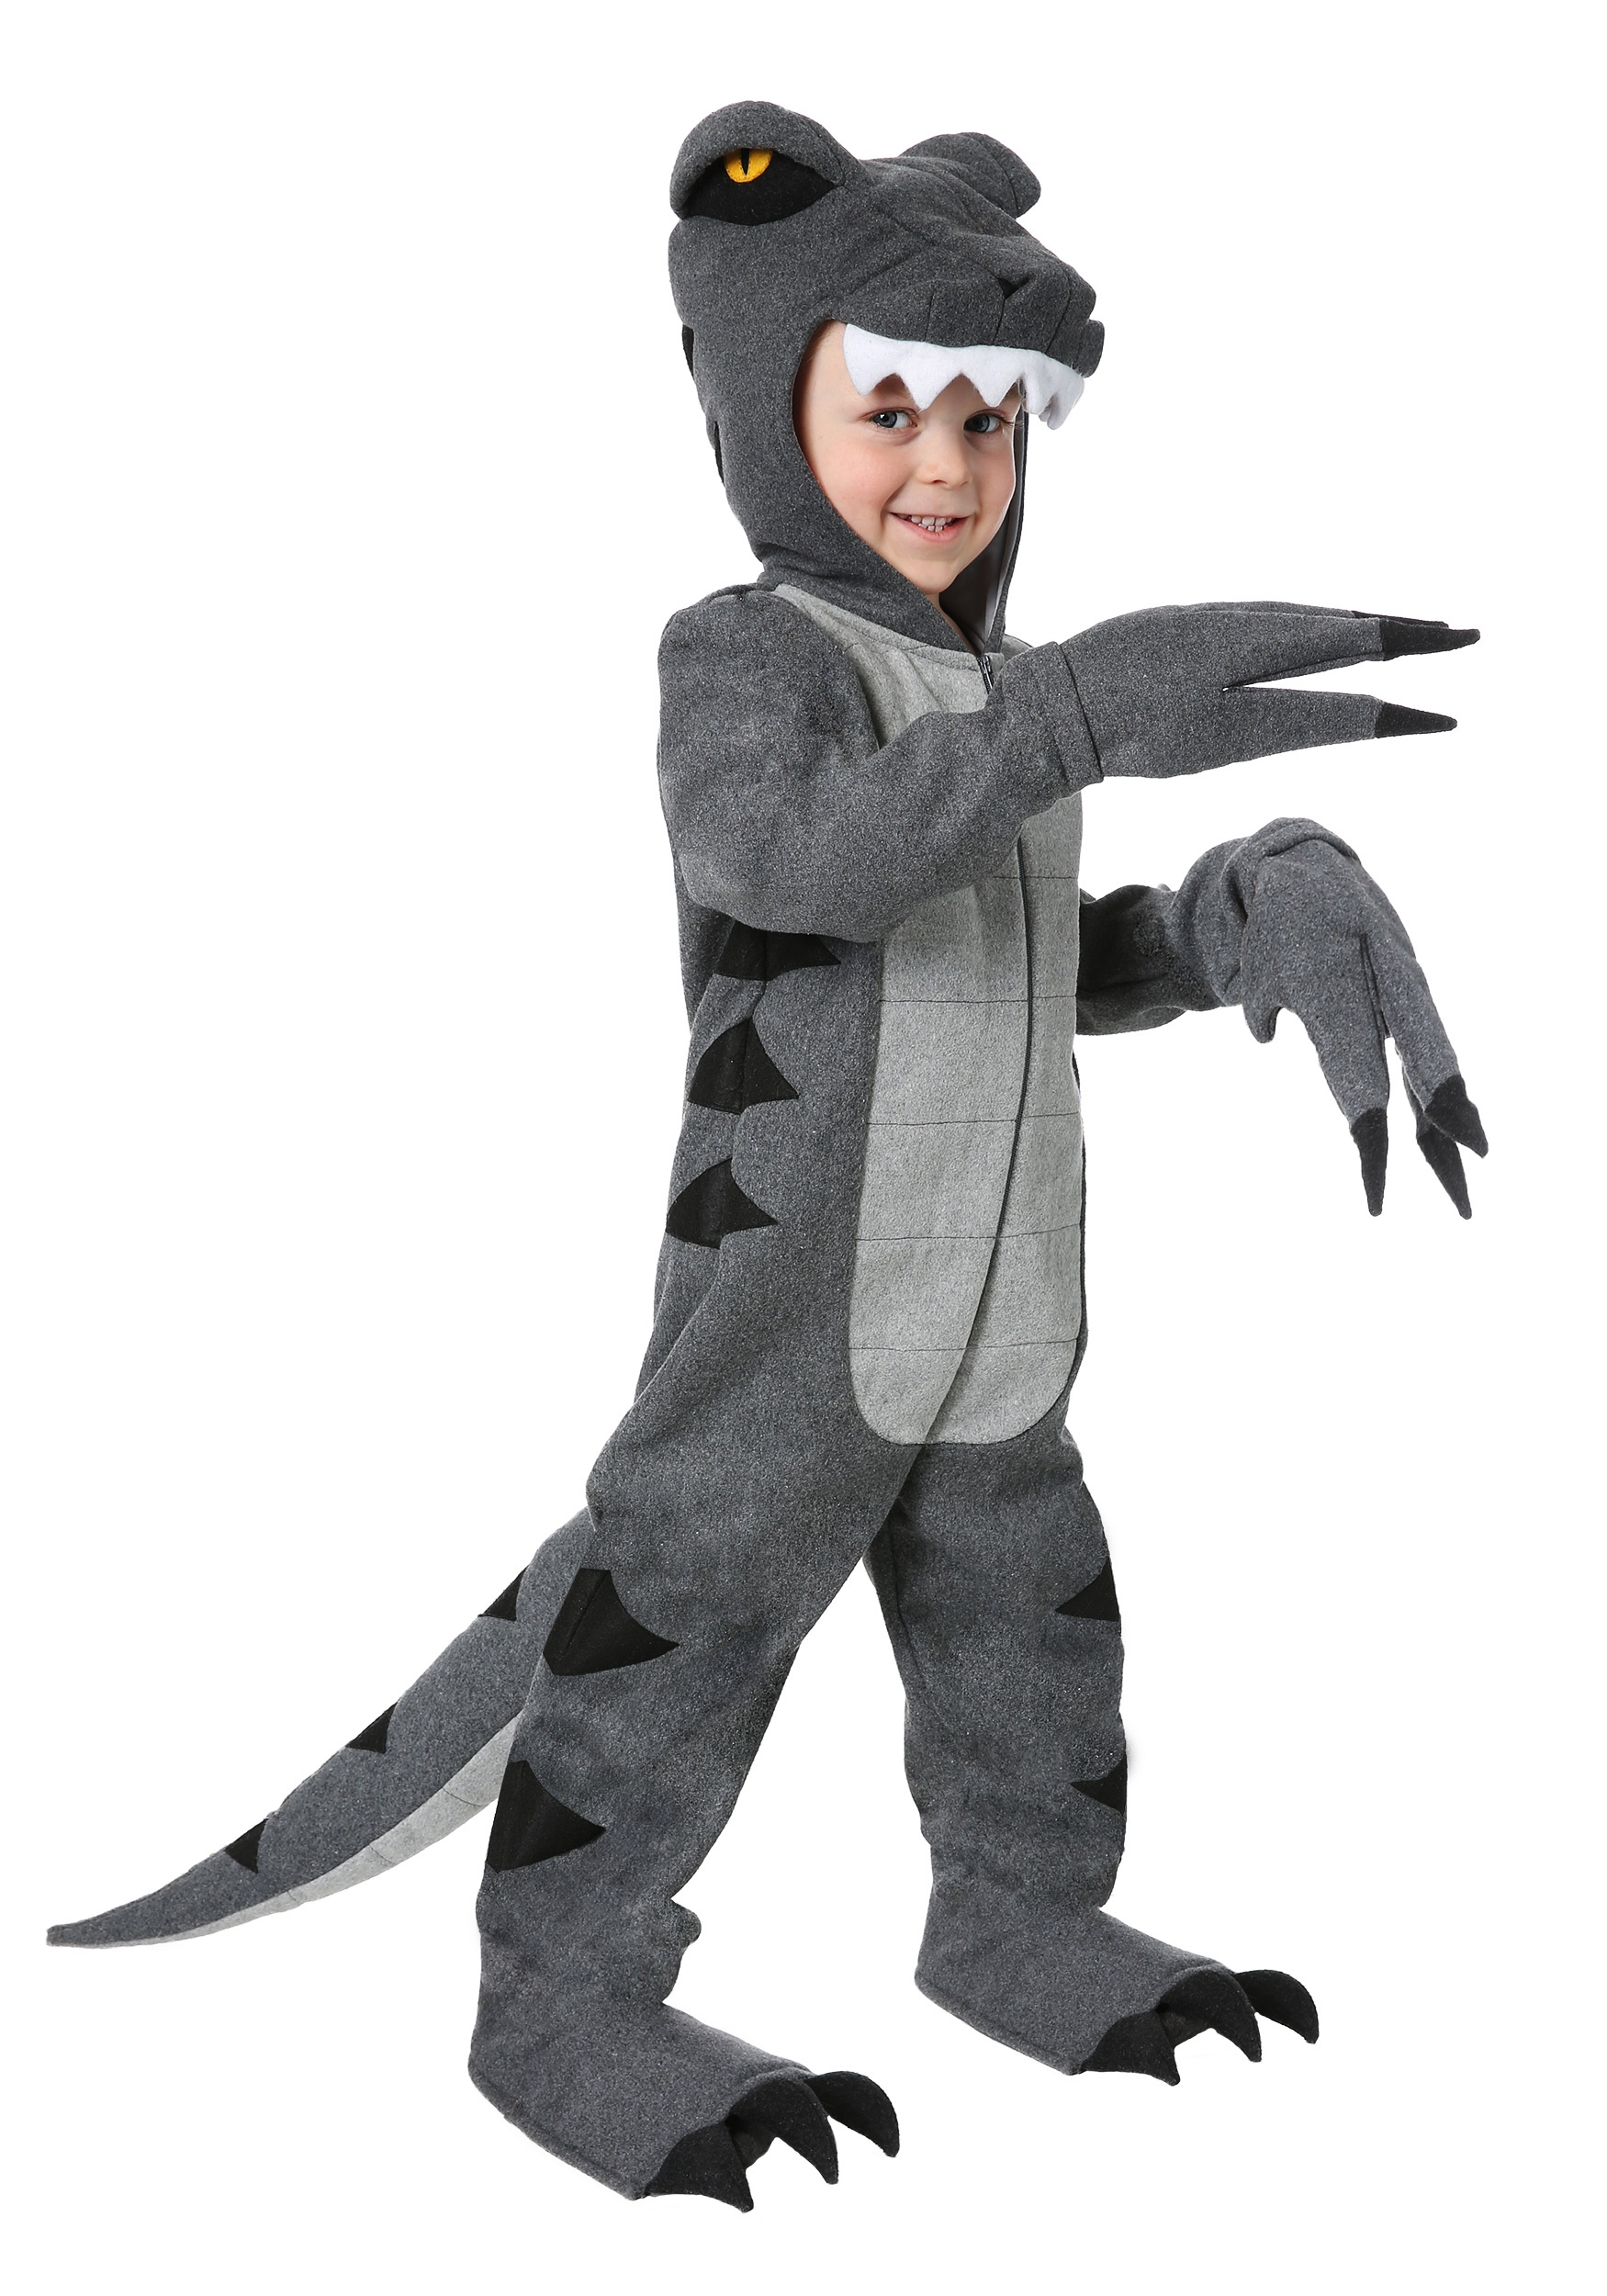 Scenic Wooly T Rex Costume Kids T Rex Costume Walmart T Rex Costume Pattern baby T Rex Costume